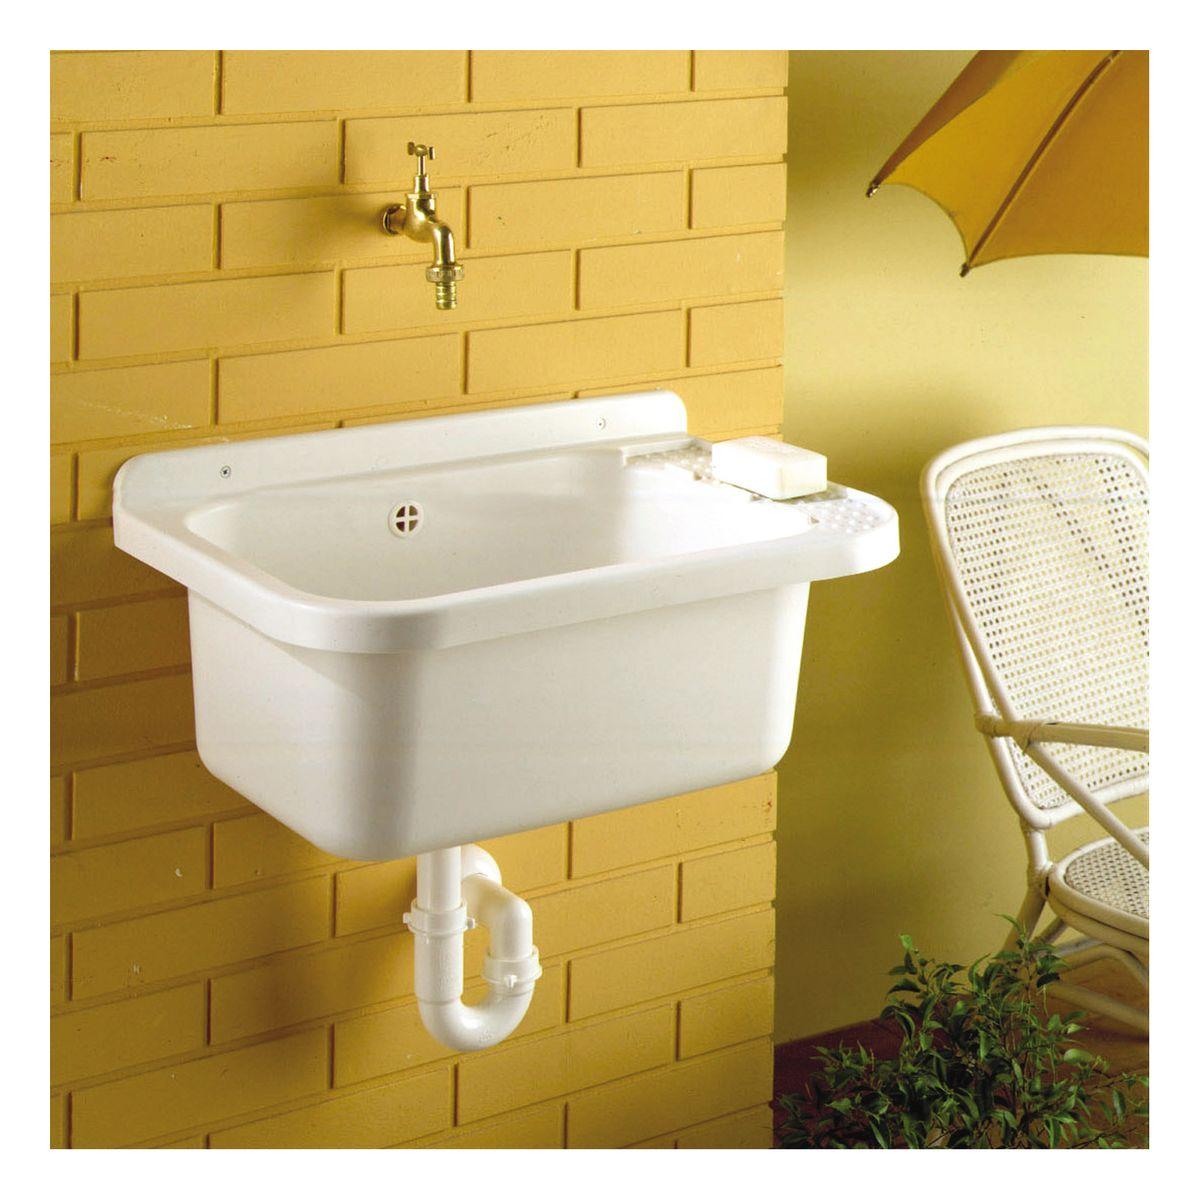 Best lavatoio ceramica prezzi contemporary - Mobili lavanderia ...